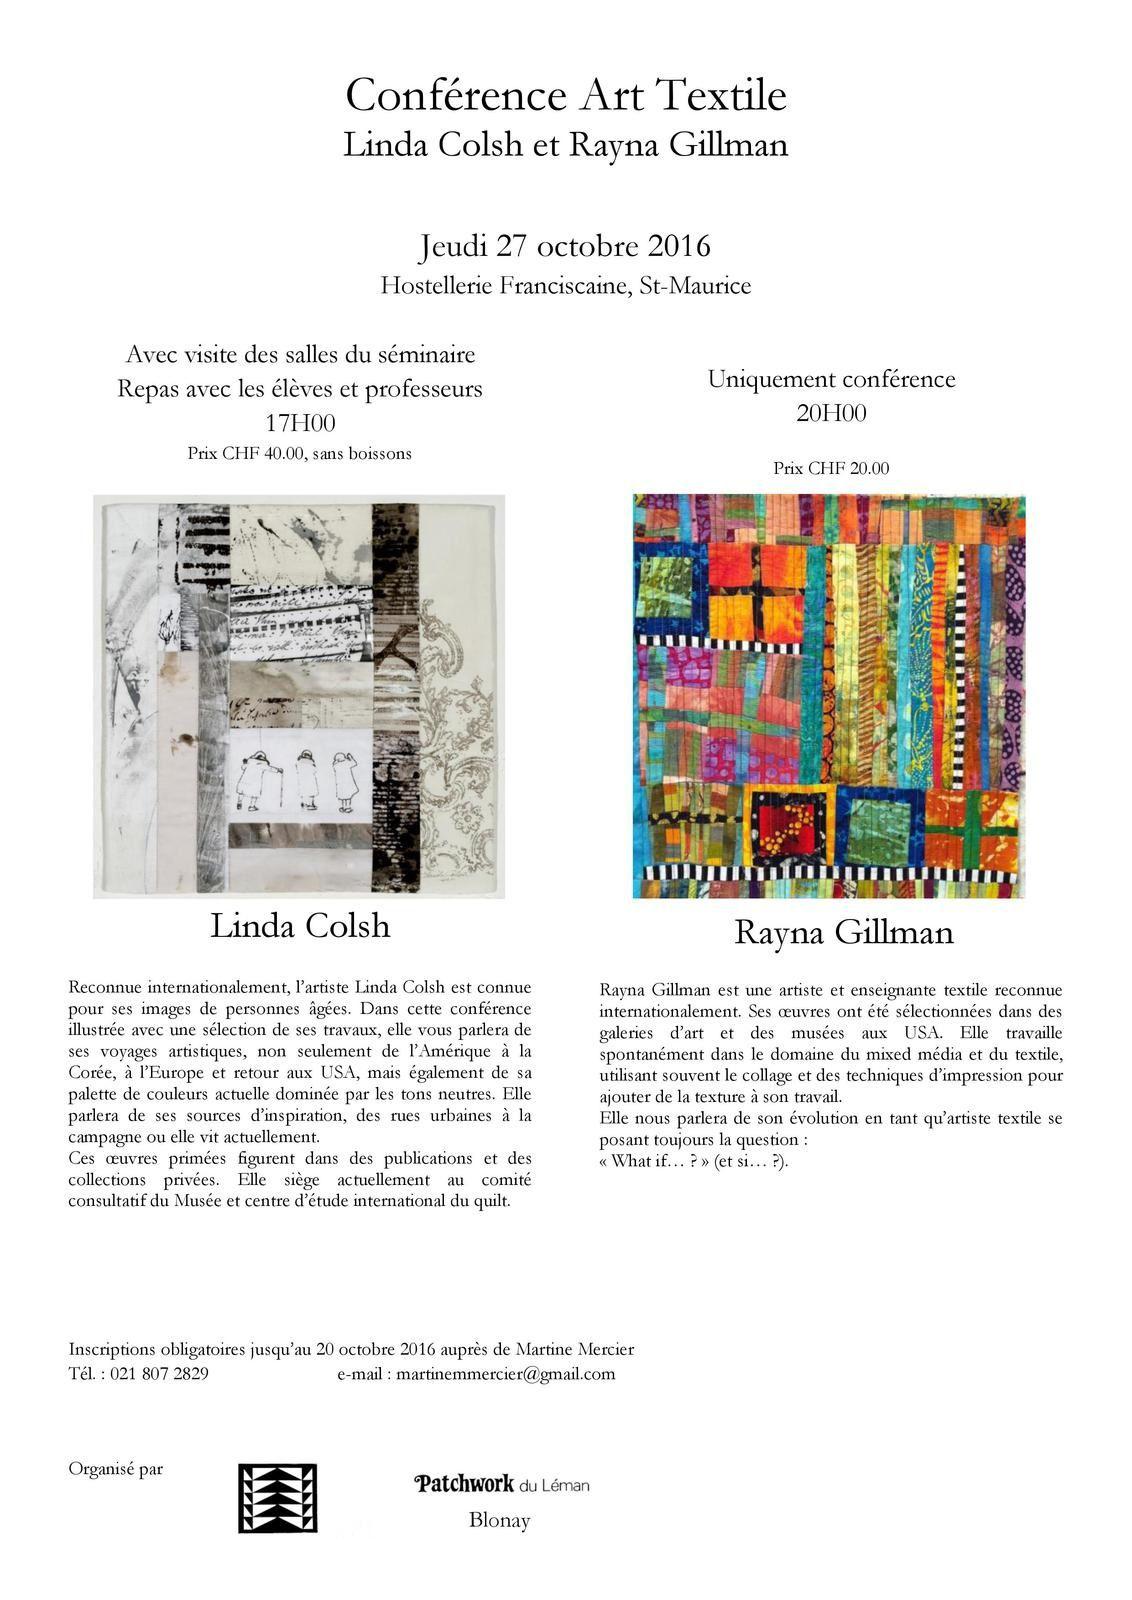 Conférence de Linda Colsh et Rayna Gillman